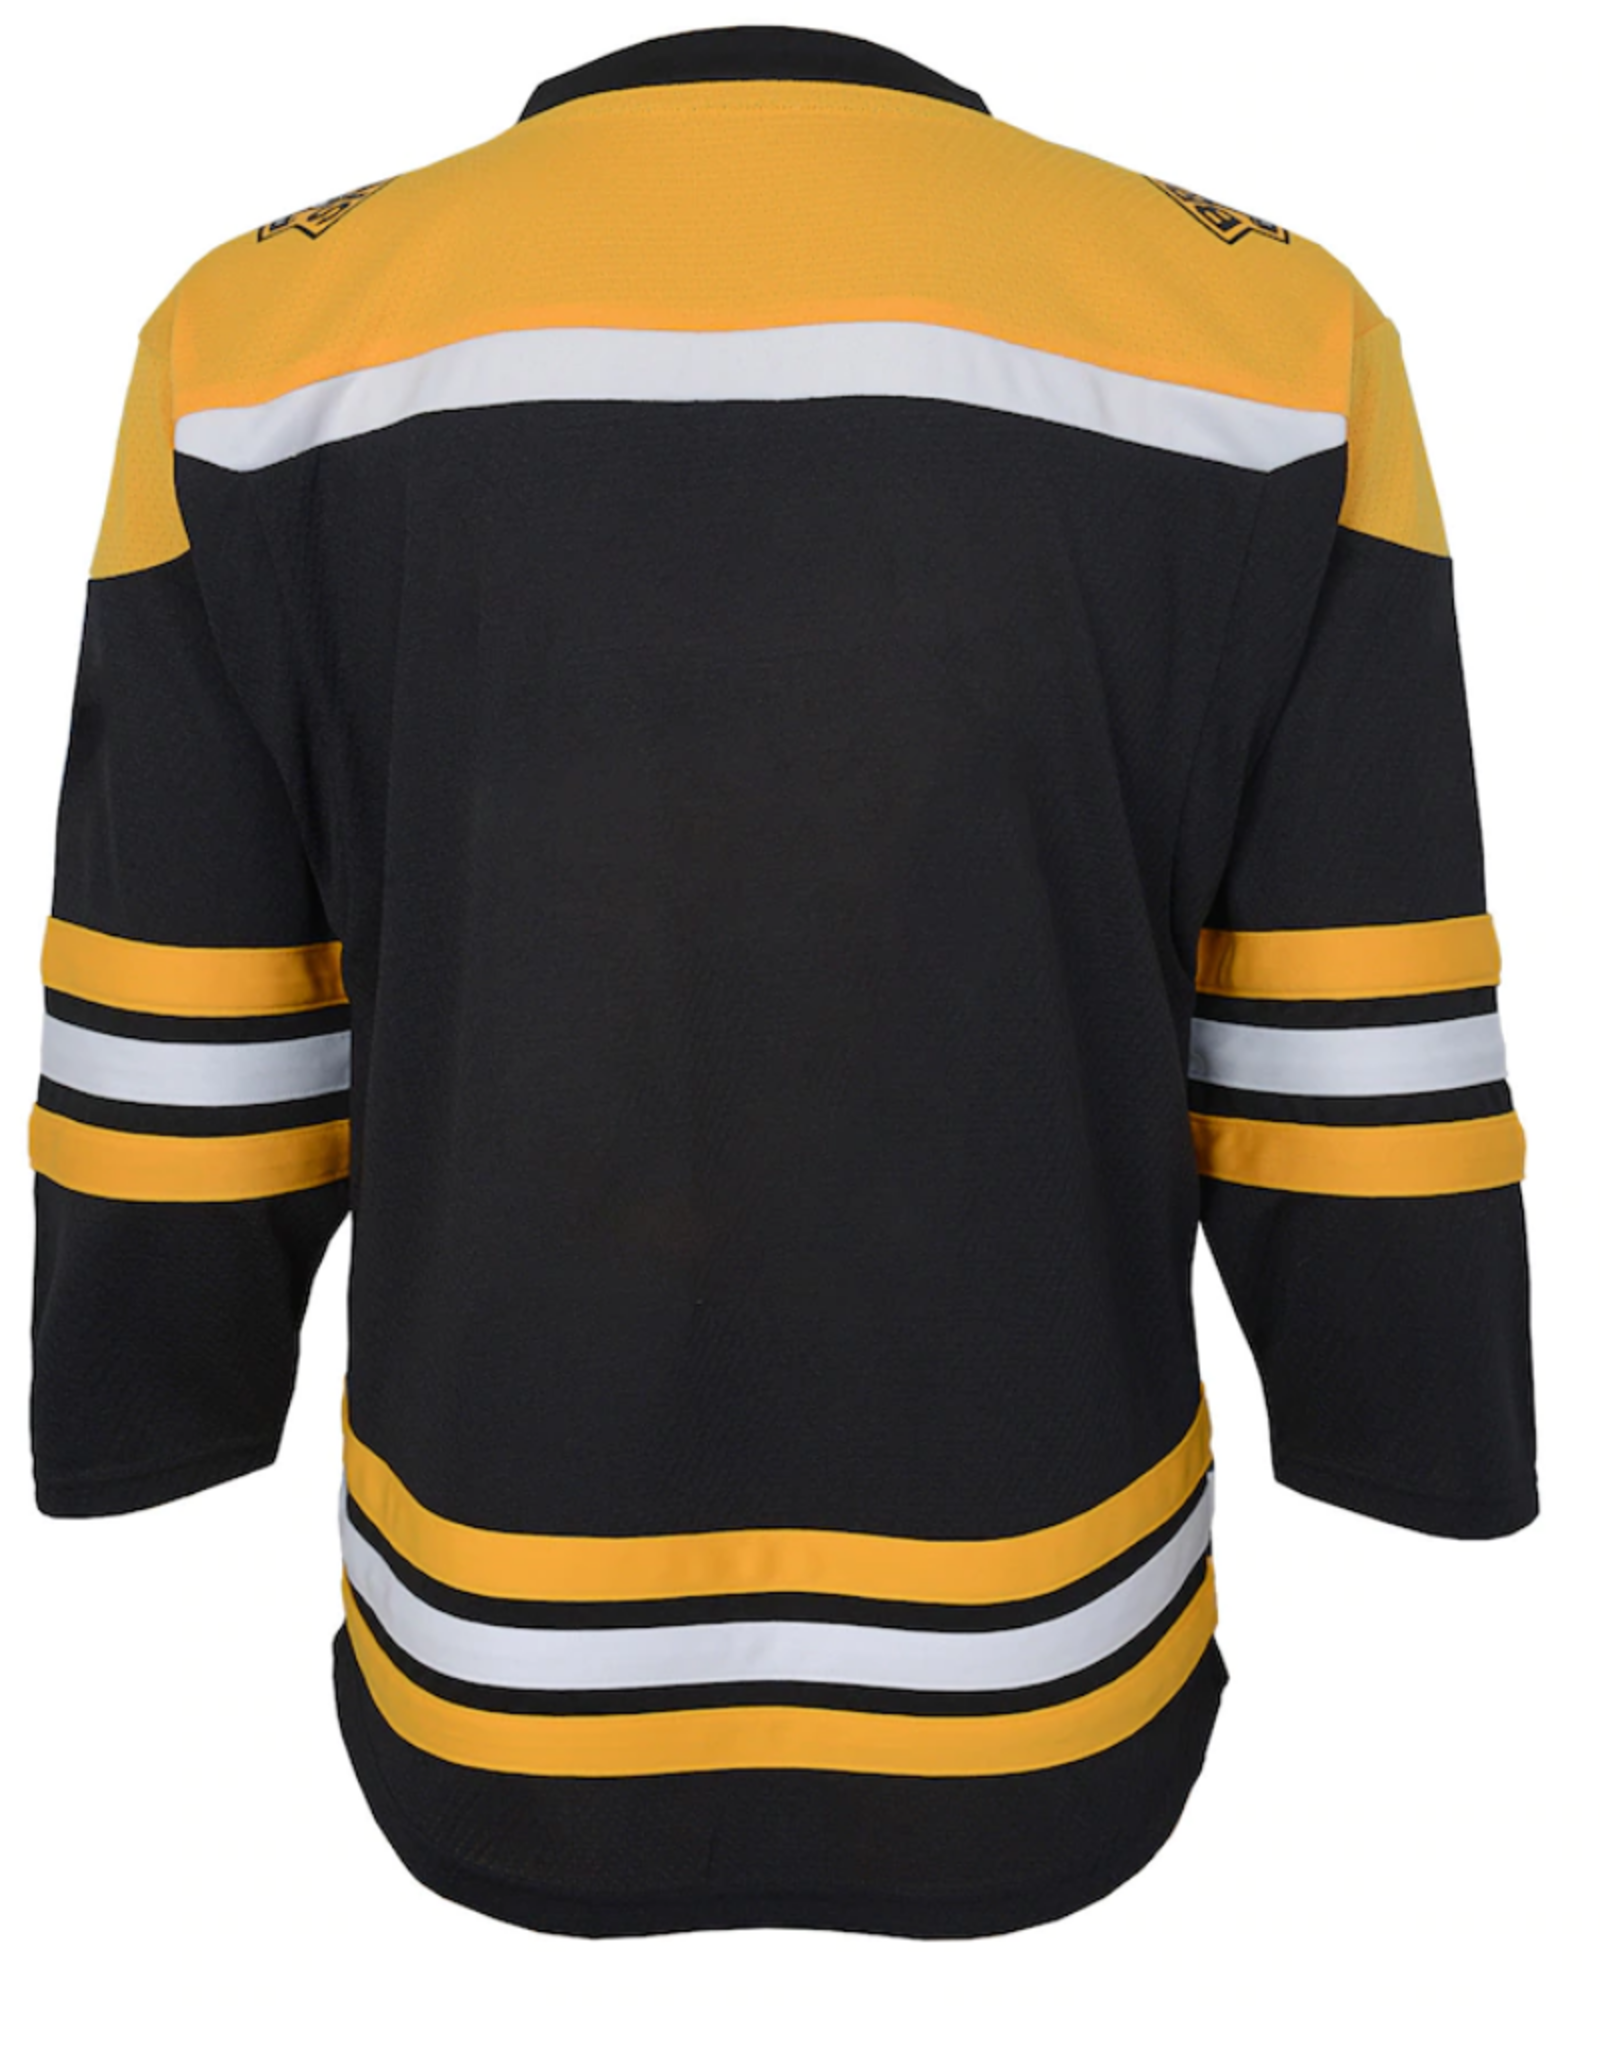 NHL Toddler Replica Home Jersey Boston Bruins 2/4T